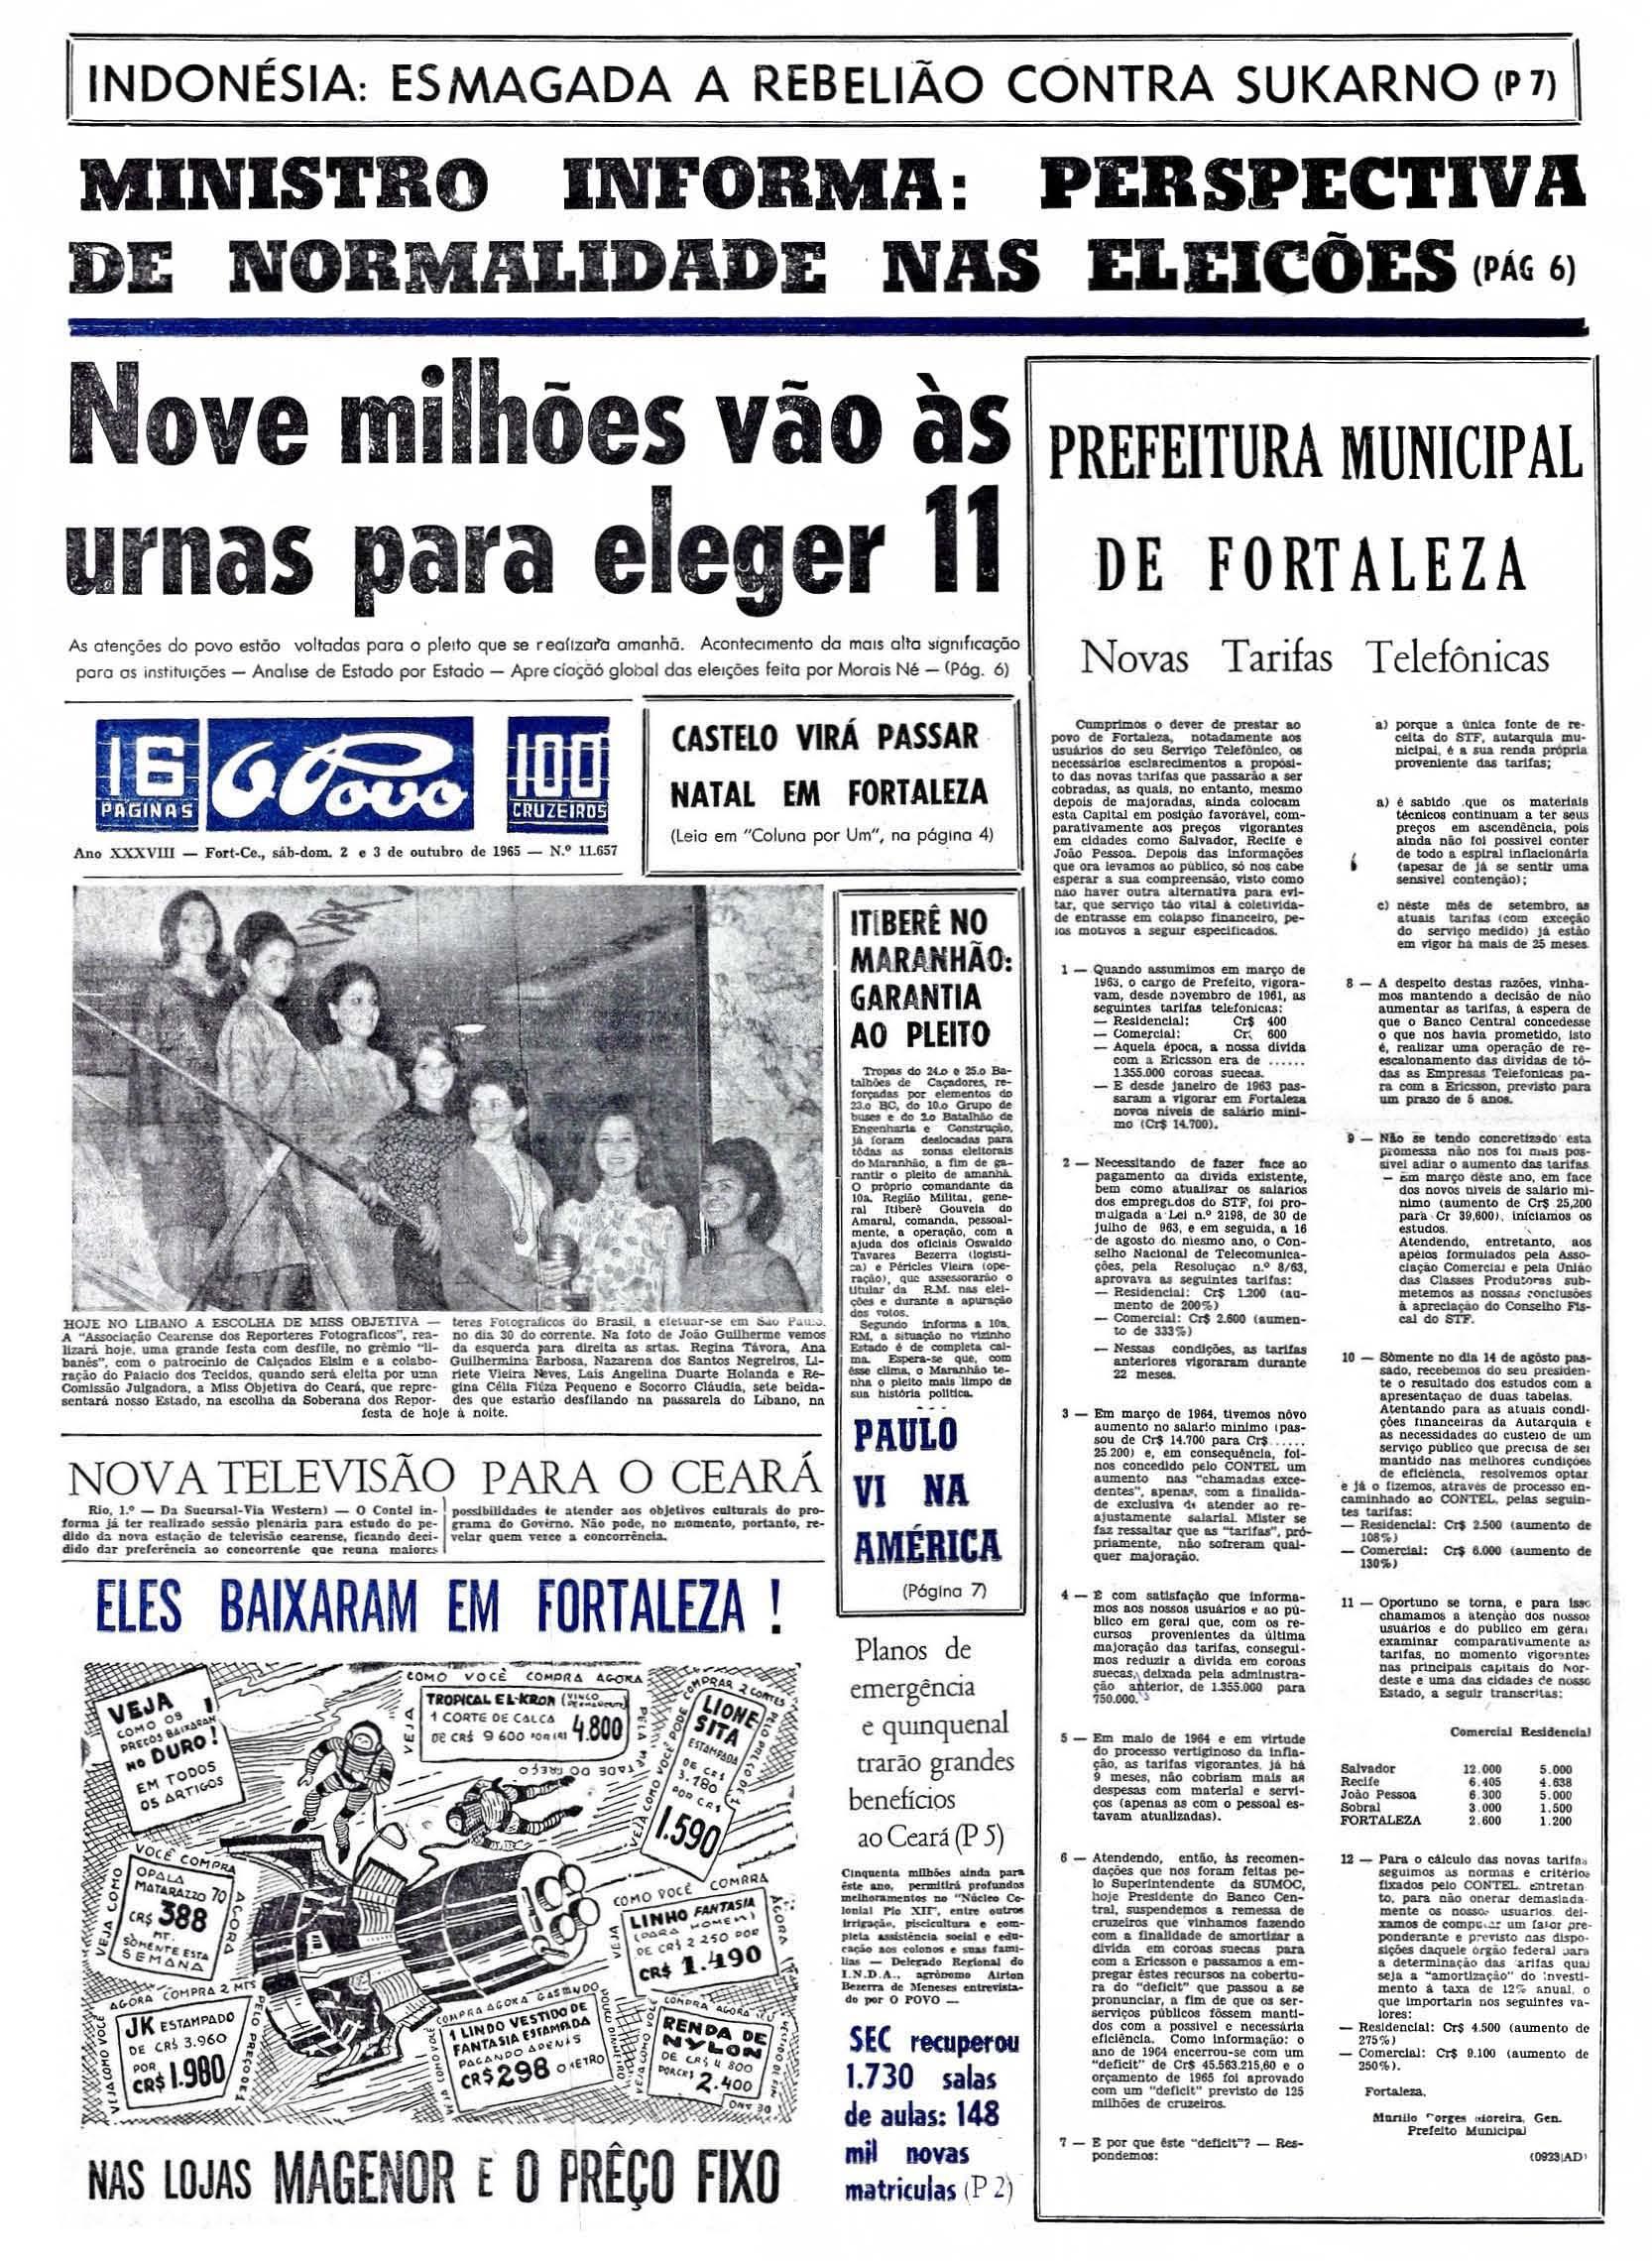 02-10-1965